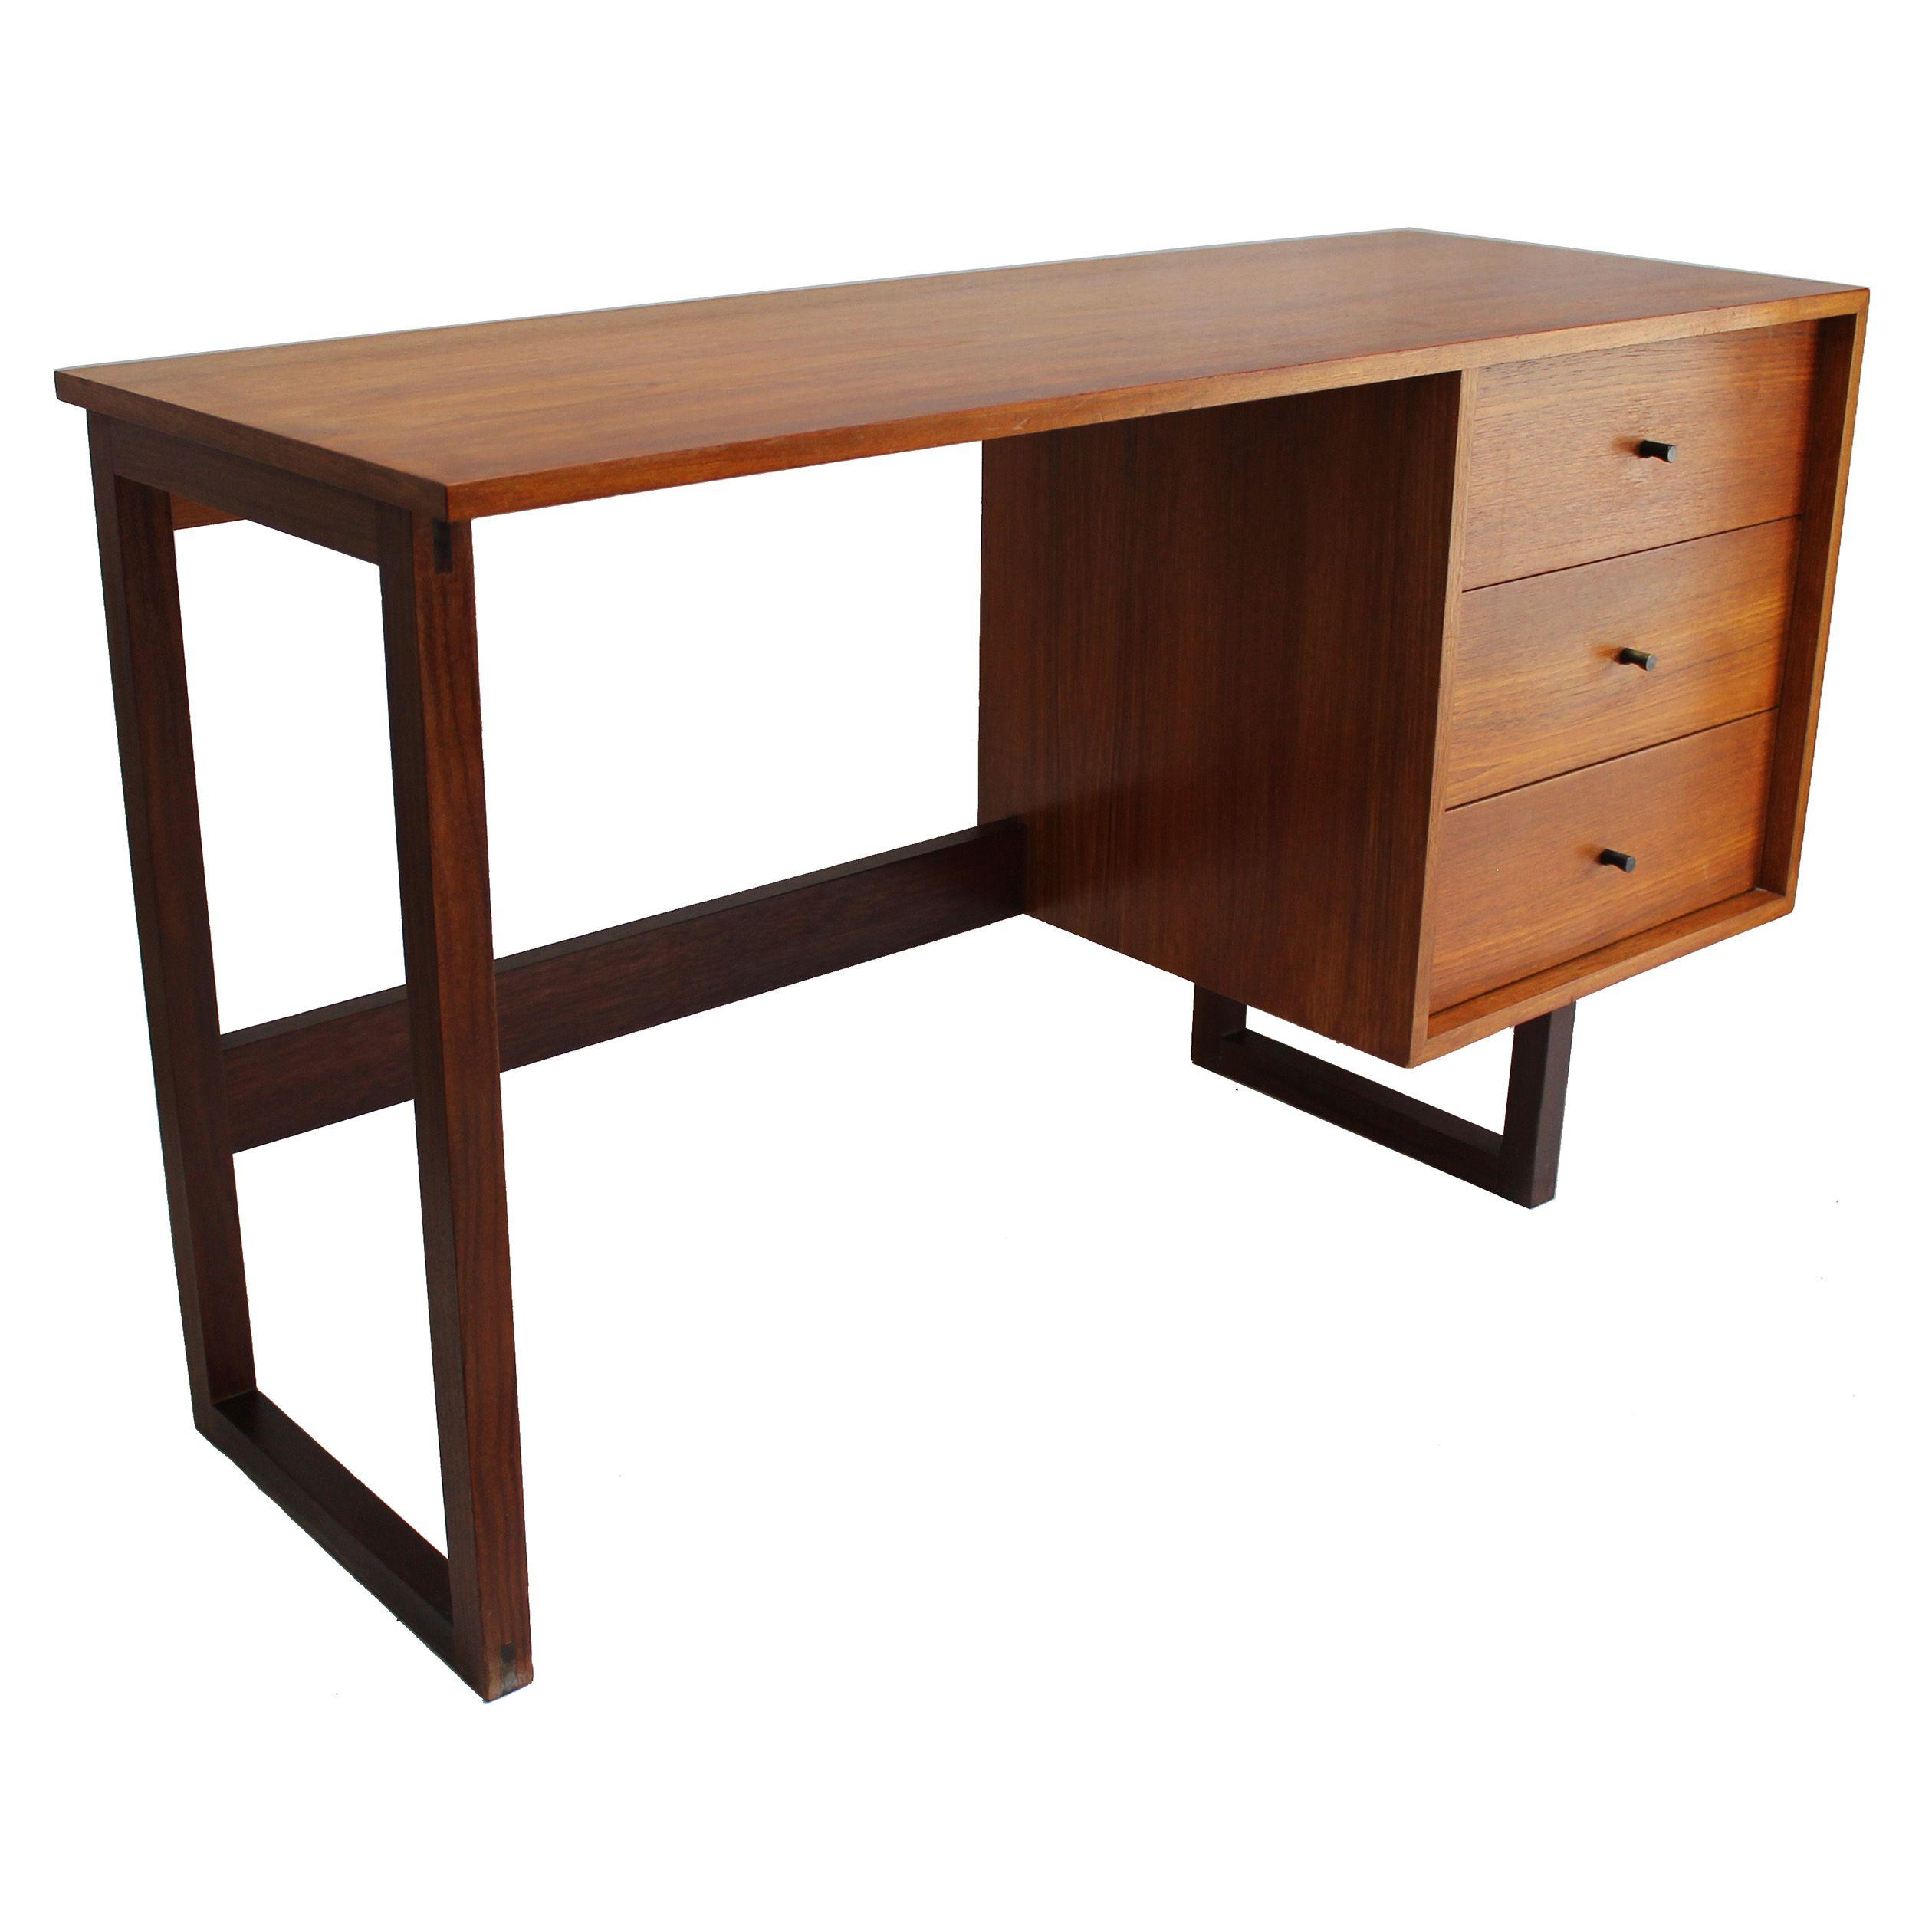 1960s R S Associates Mid Century Danish Modern Teak Desk Xoatom Com Mid Century Furniture Mid Century Modern Chair Mid Century Design